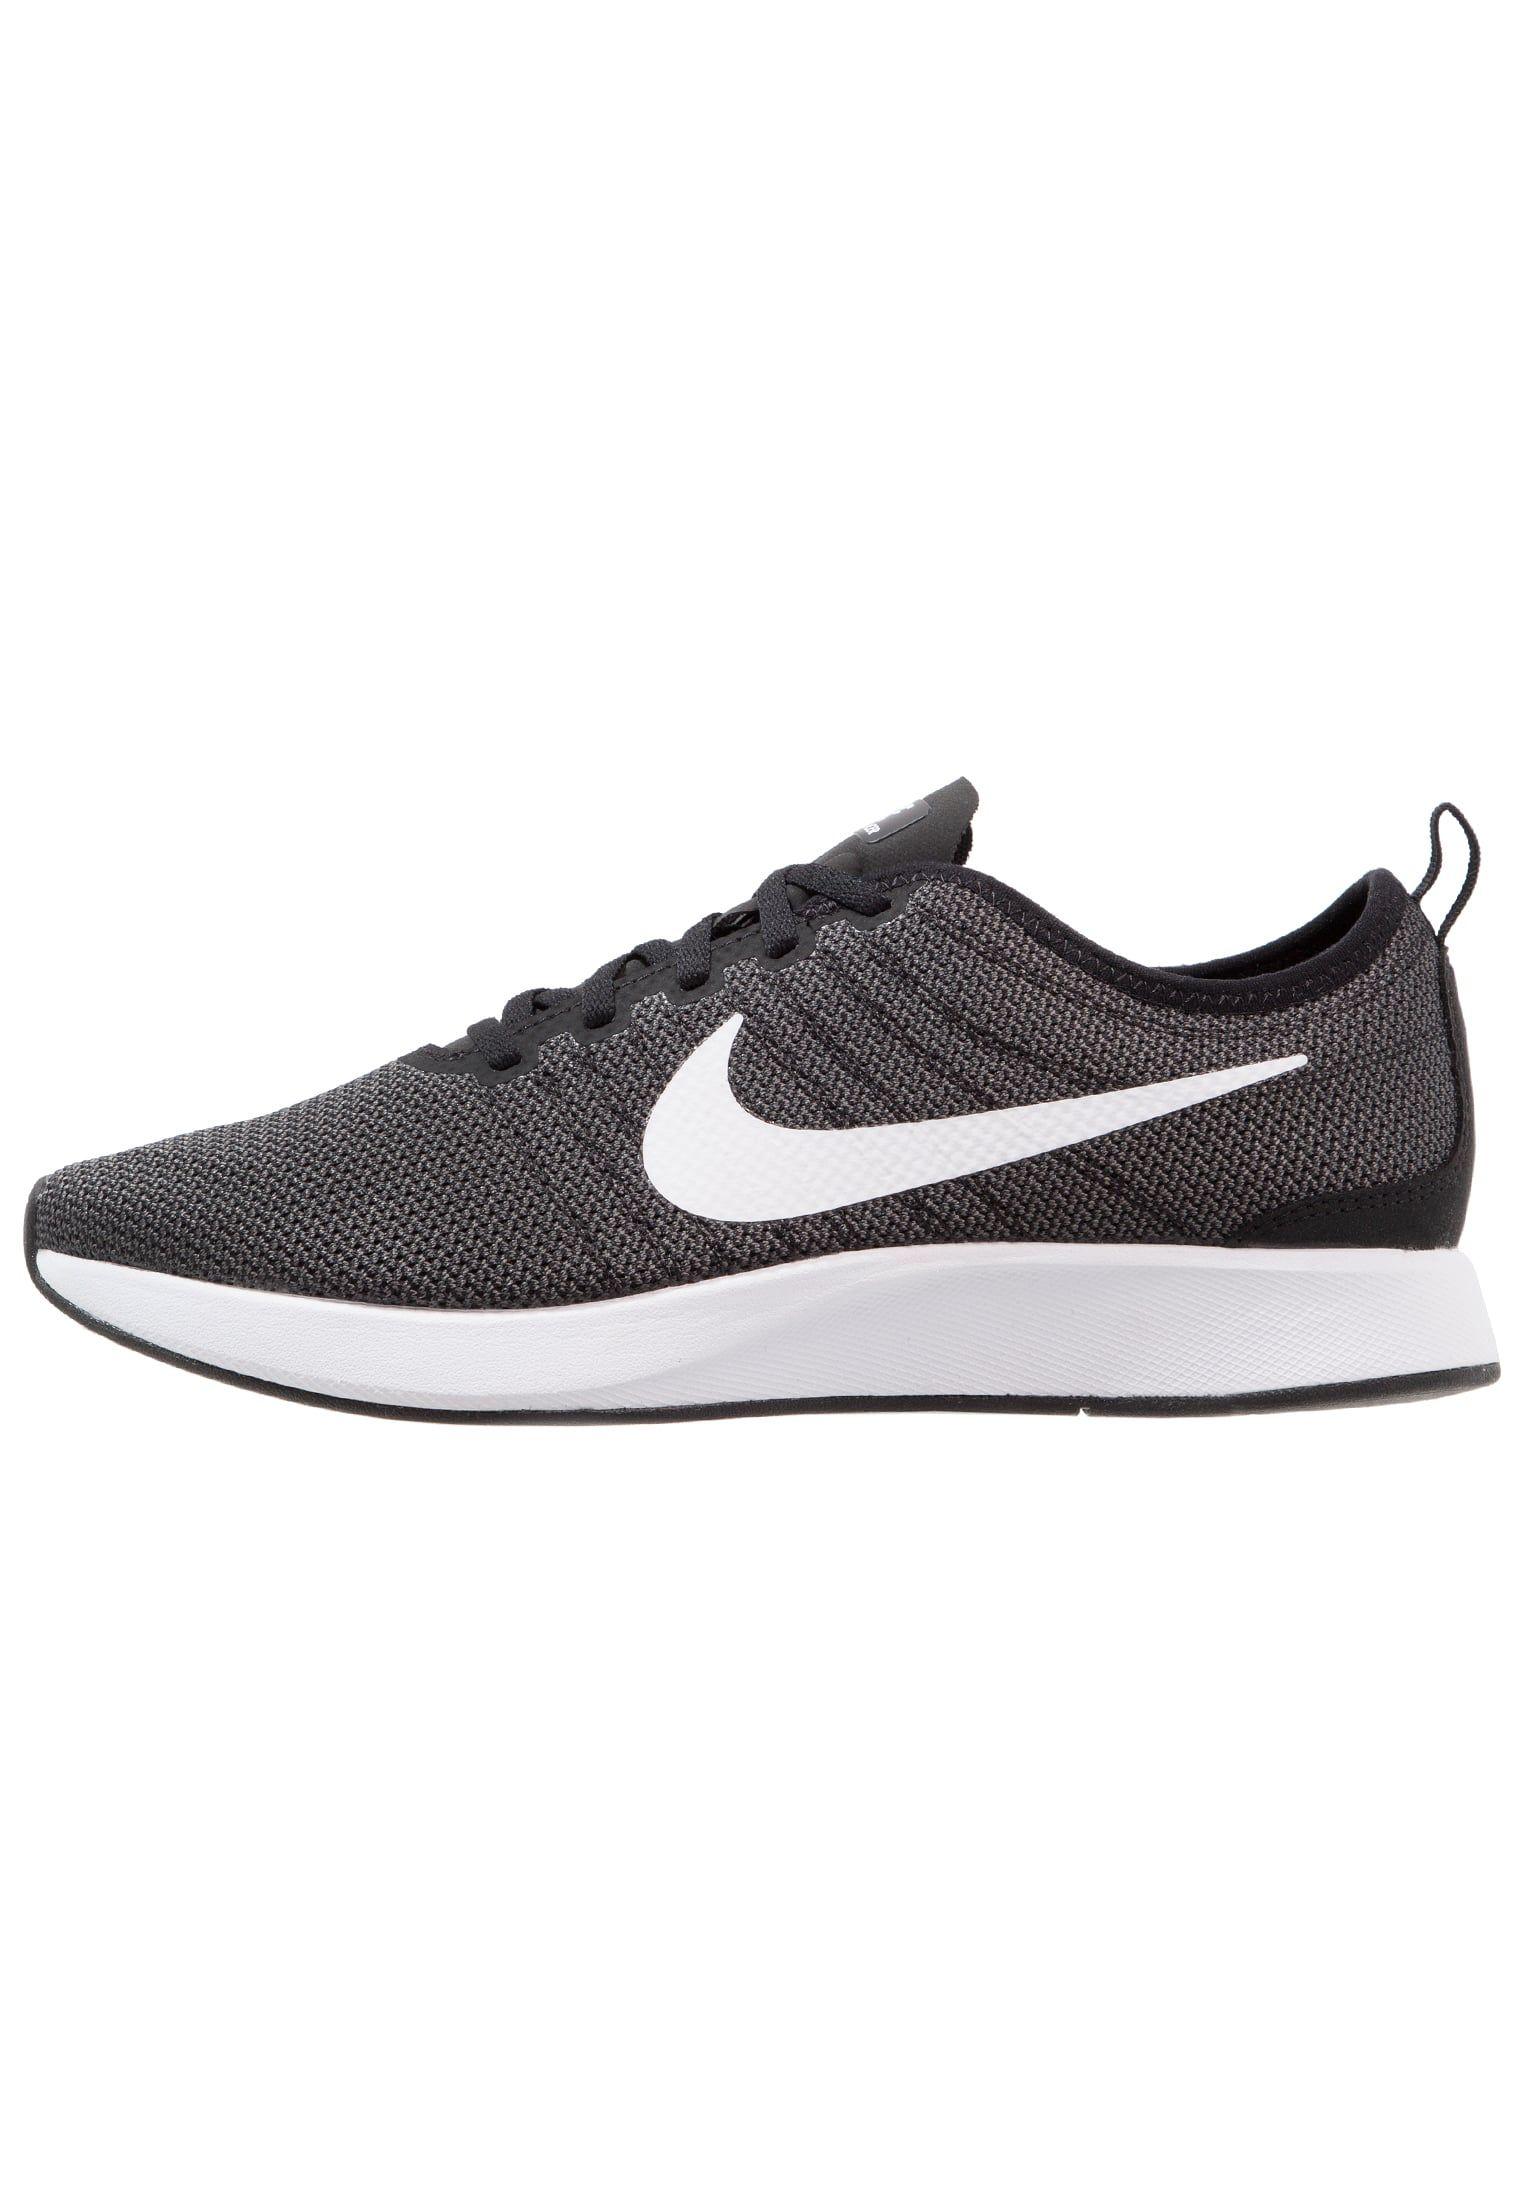 Nike Sportswear DUALTONE RACER - Trainers - white/wolf grey/black ubEvORPTyE